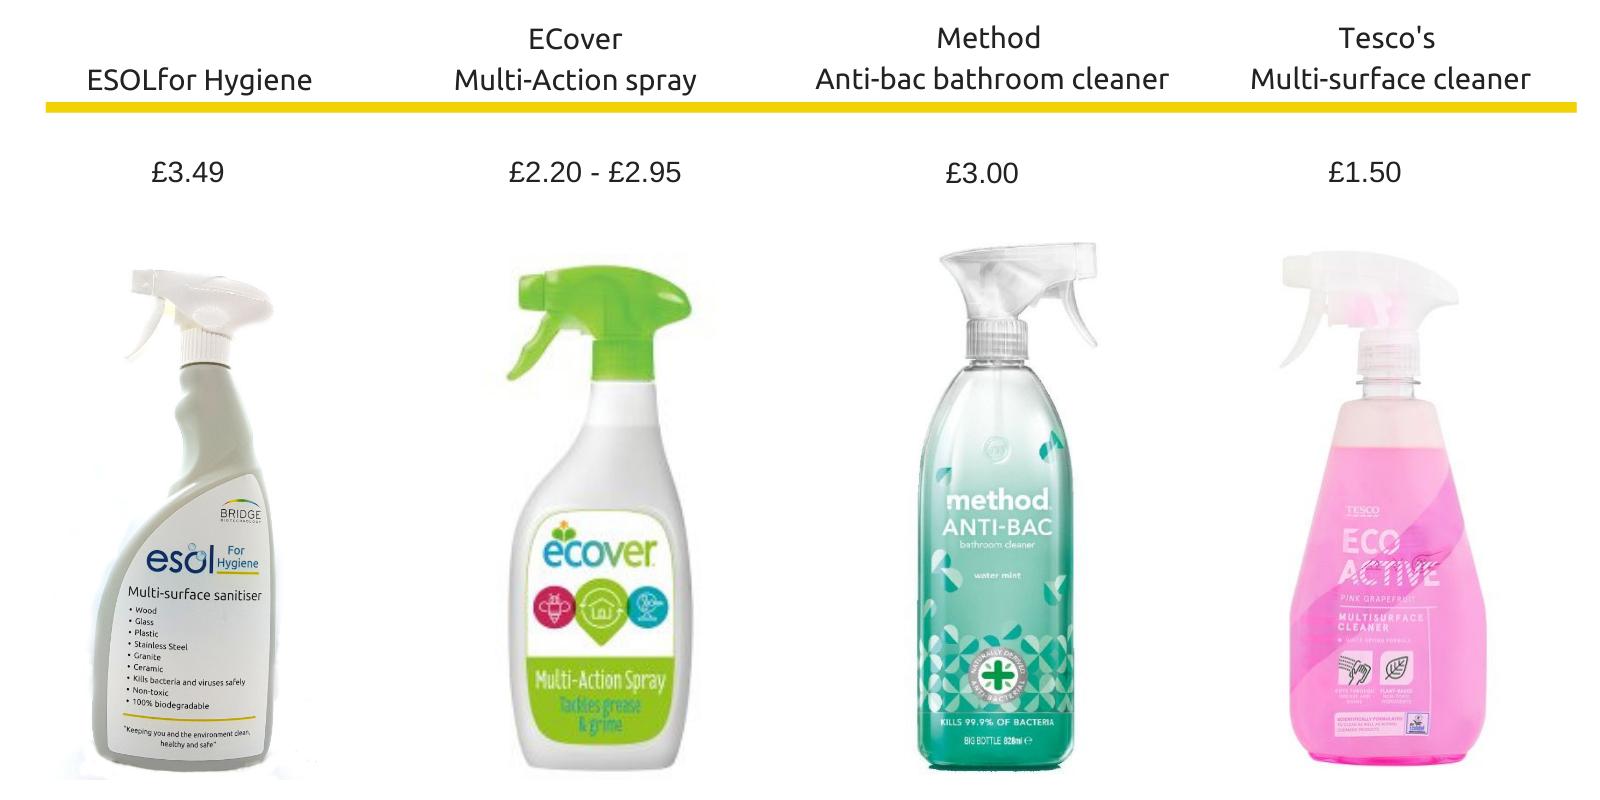 Safe cleaning alternatives for my kitchen - Method vs ECover vs Tescos vs ESOL